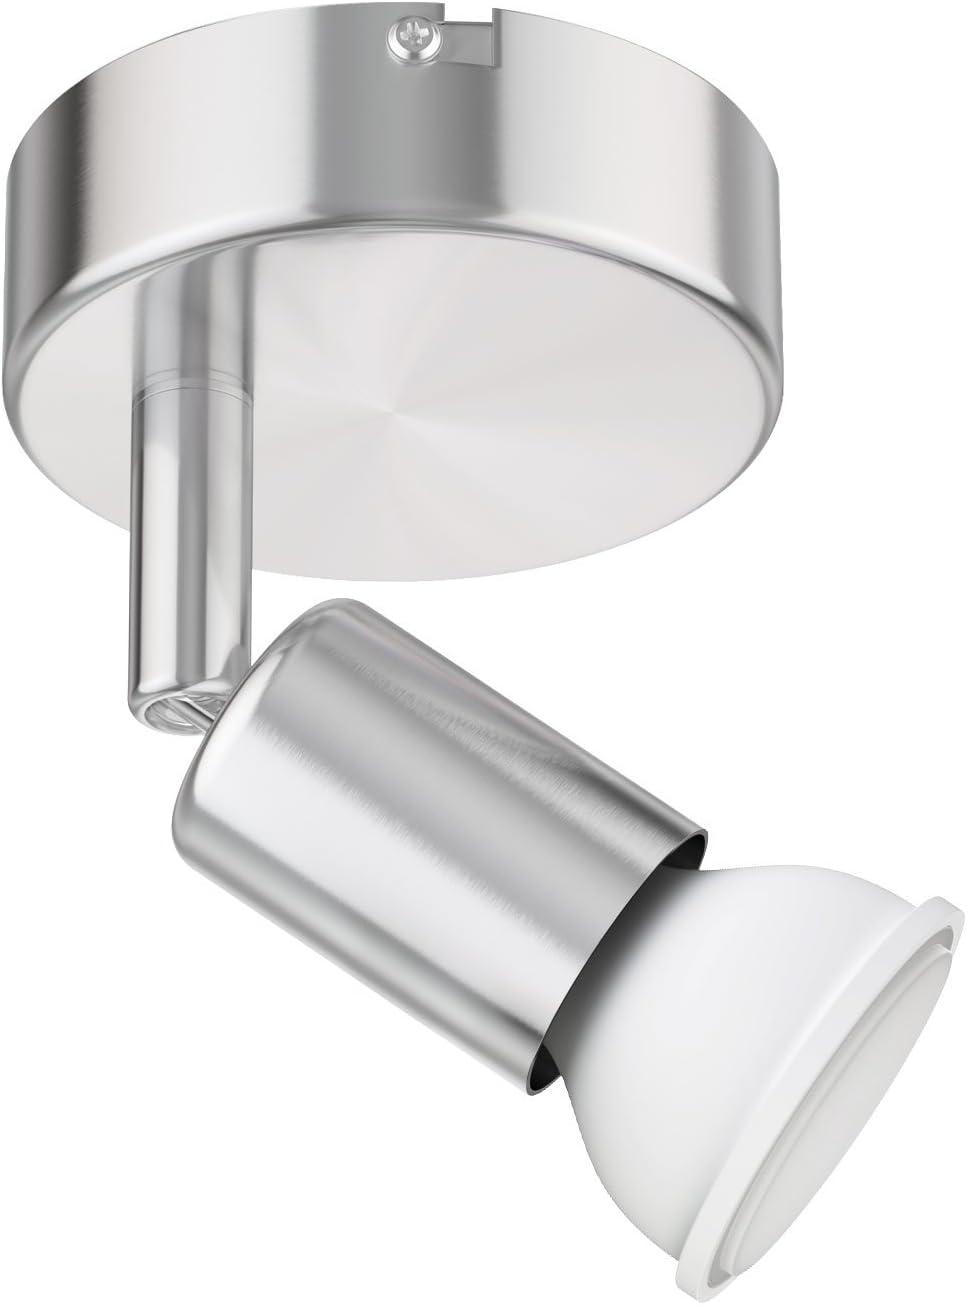 ledscom.de Wand Leuchte LUNARA, einflammig inkl. 12lm LED GU12 Lampe  warm weiß